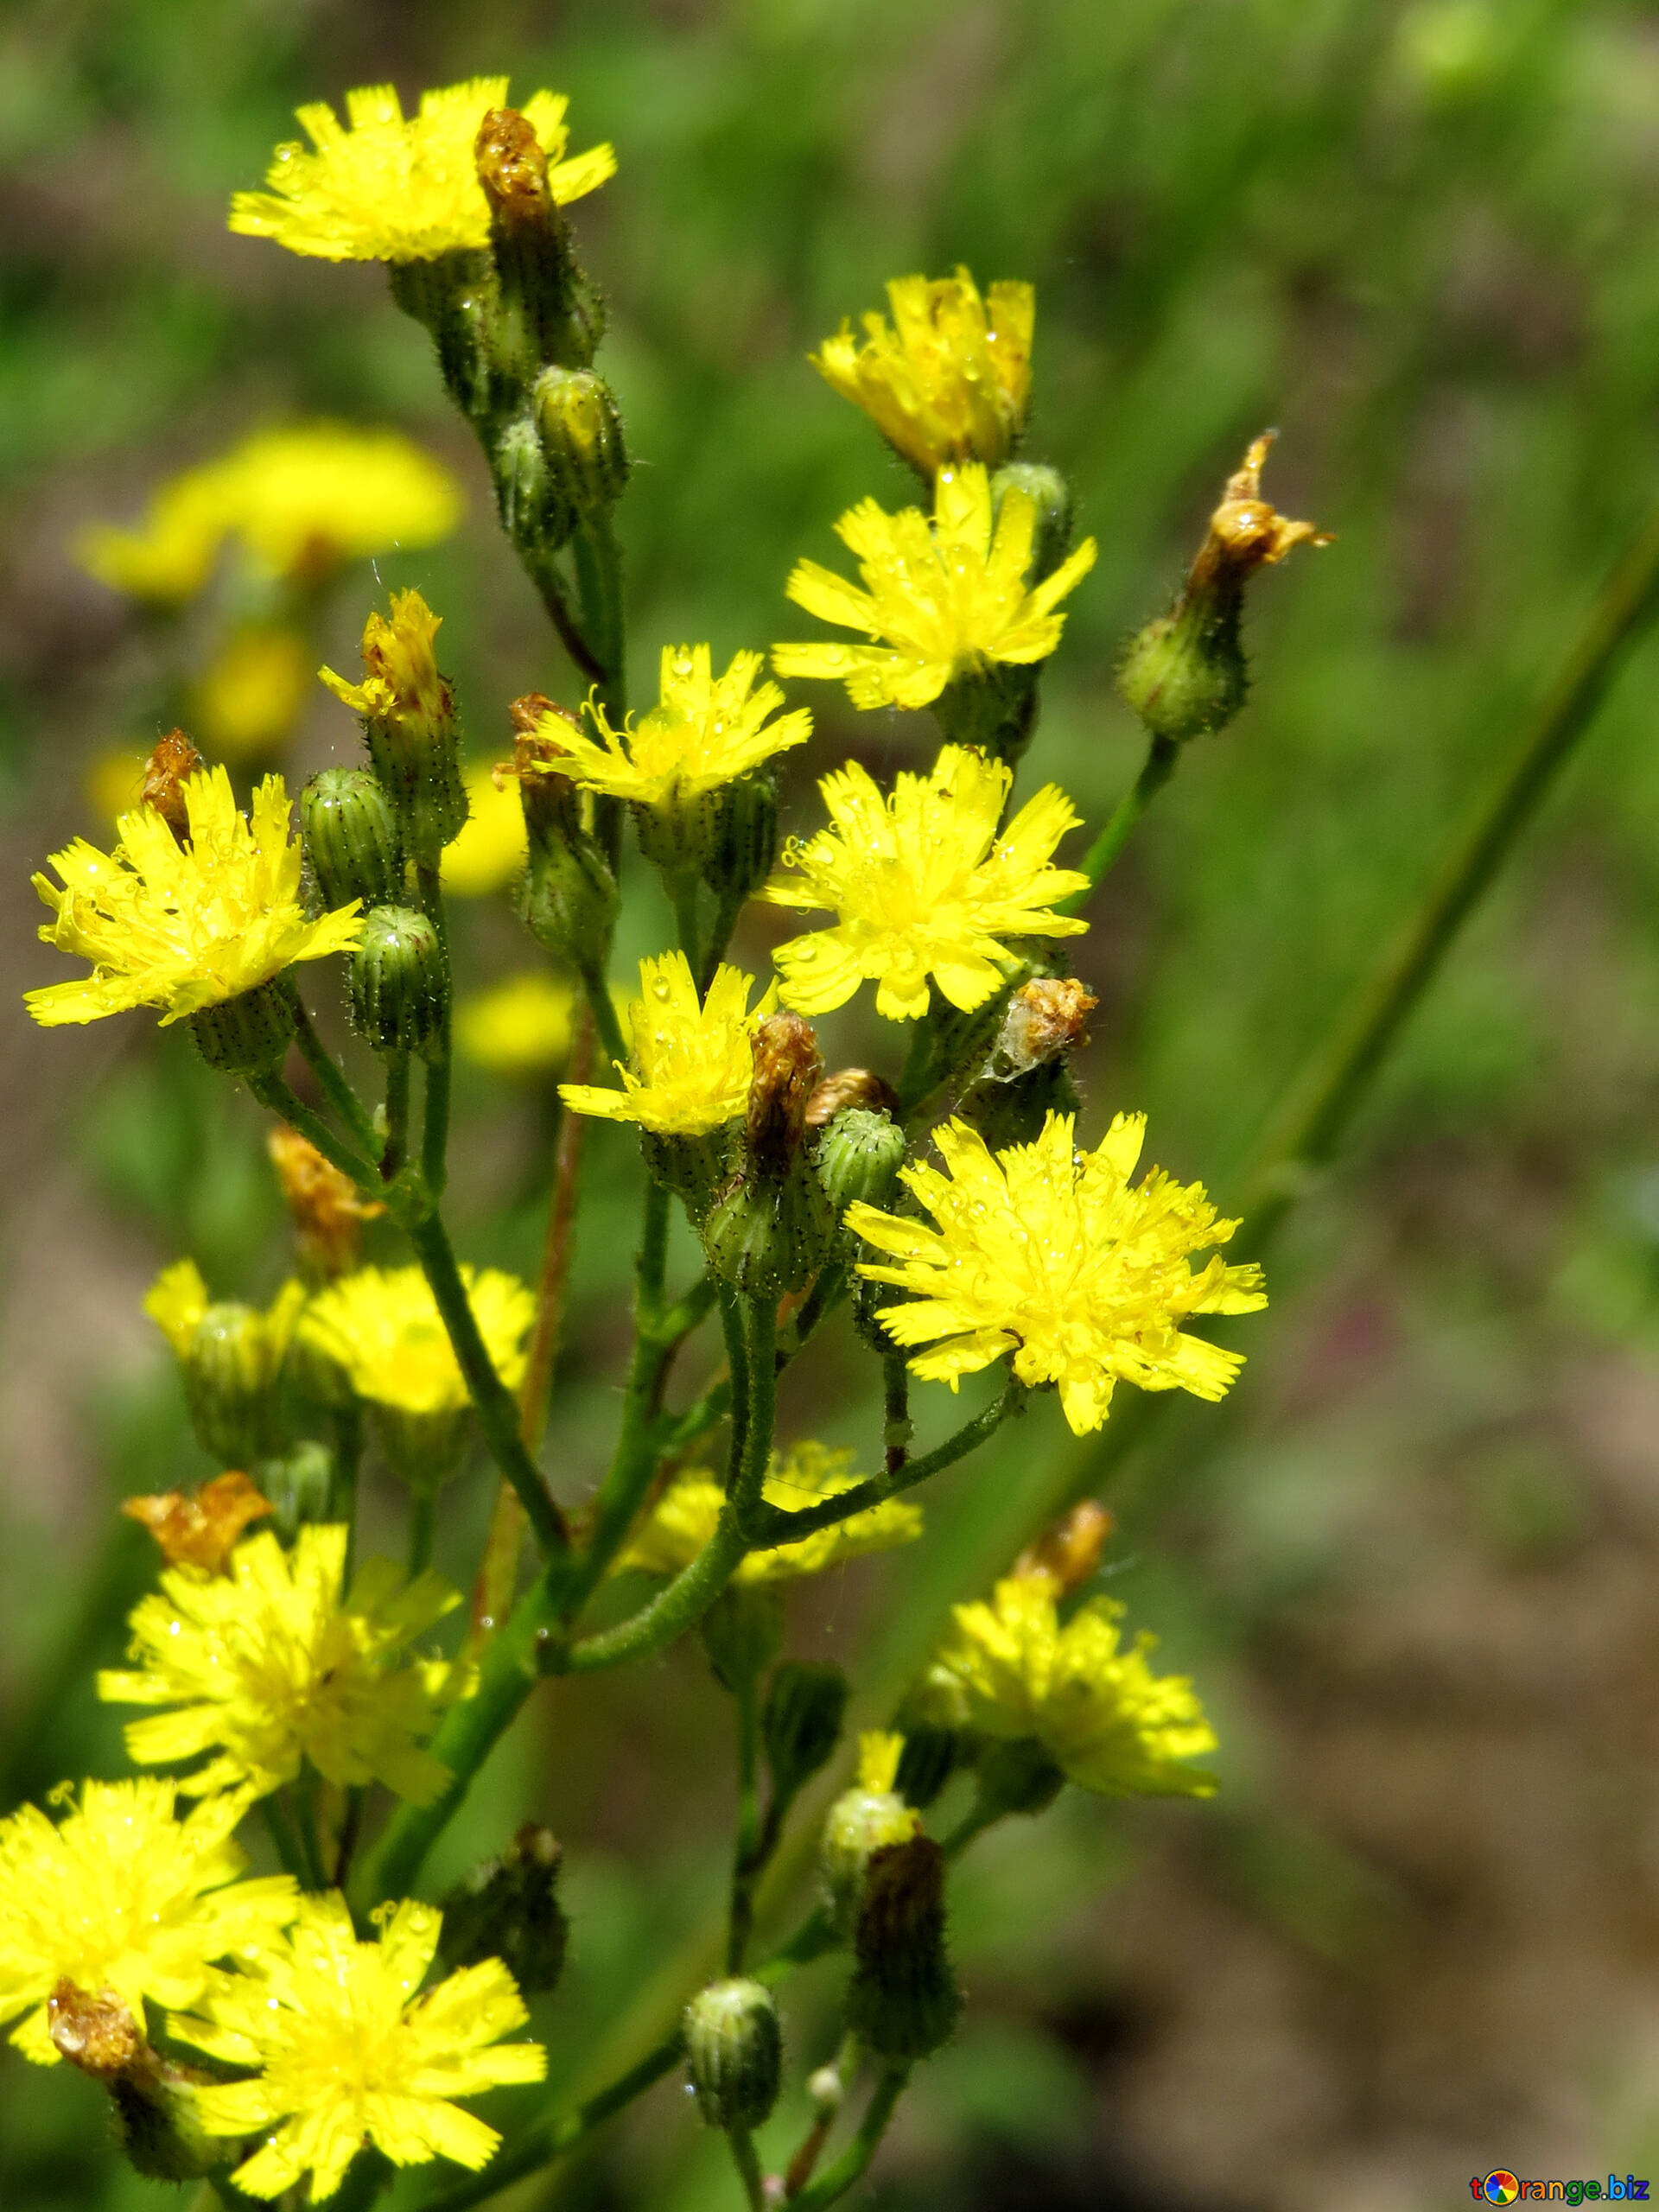 Wildflowers Small Yellow Flowers Grass 24931